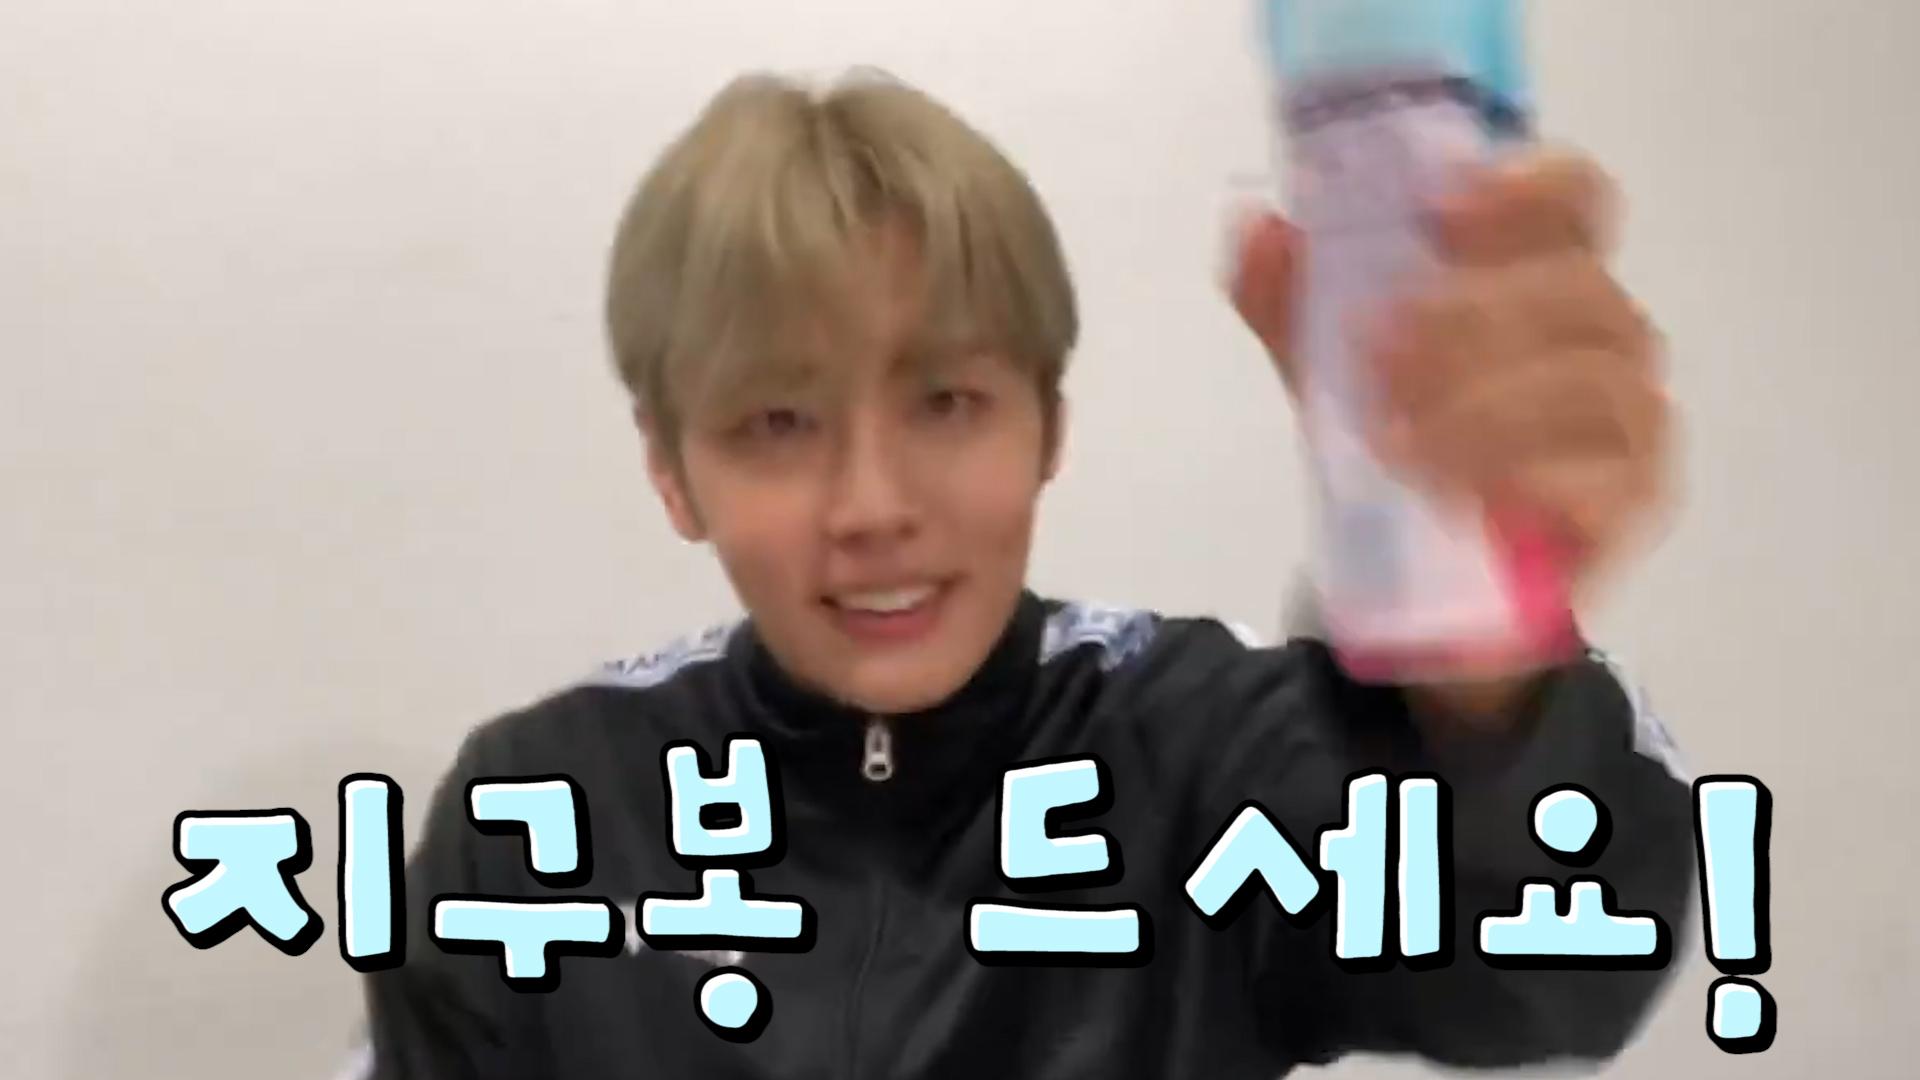 [SF9] 재유니의 잔잔한(중요) 방구석 콘서트네요^^💥 (JAEYOON's never-ending roomconcert)